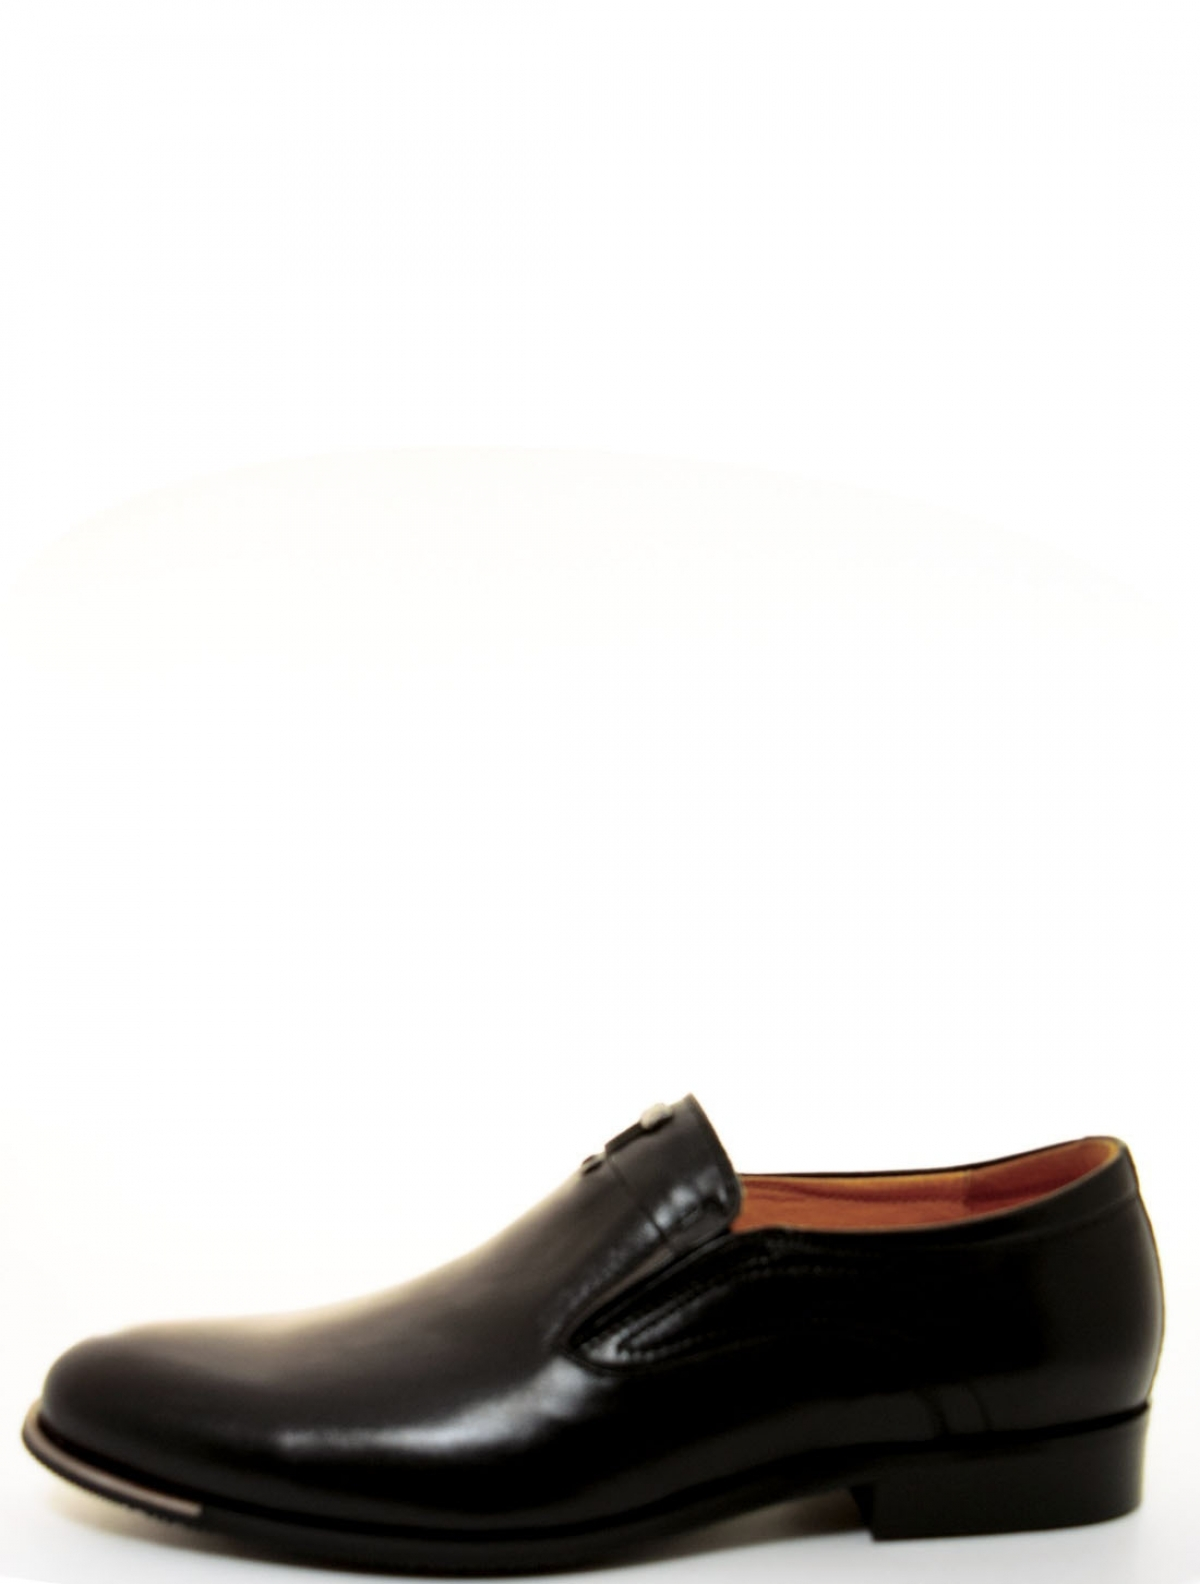 Rosconi TR181808-515-5153A мужские туфли